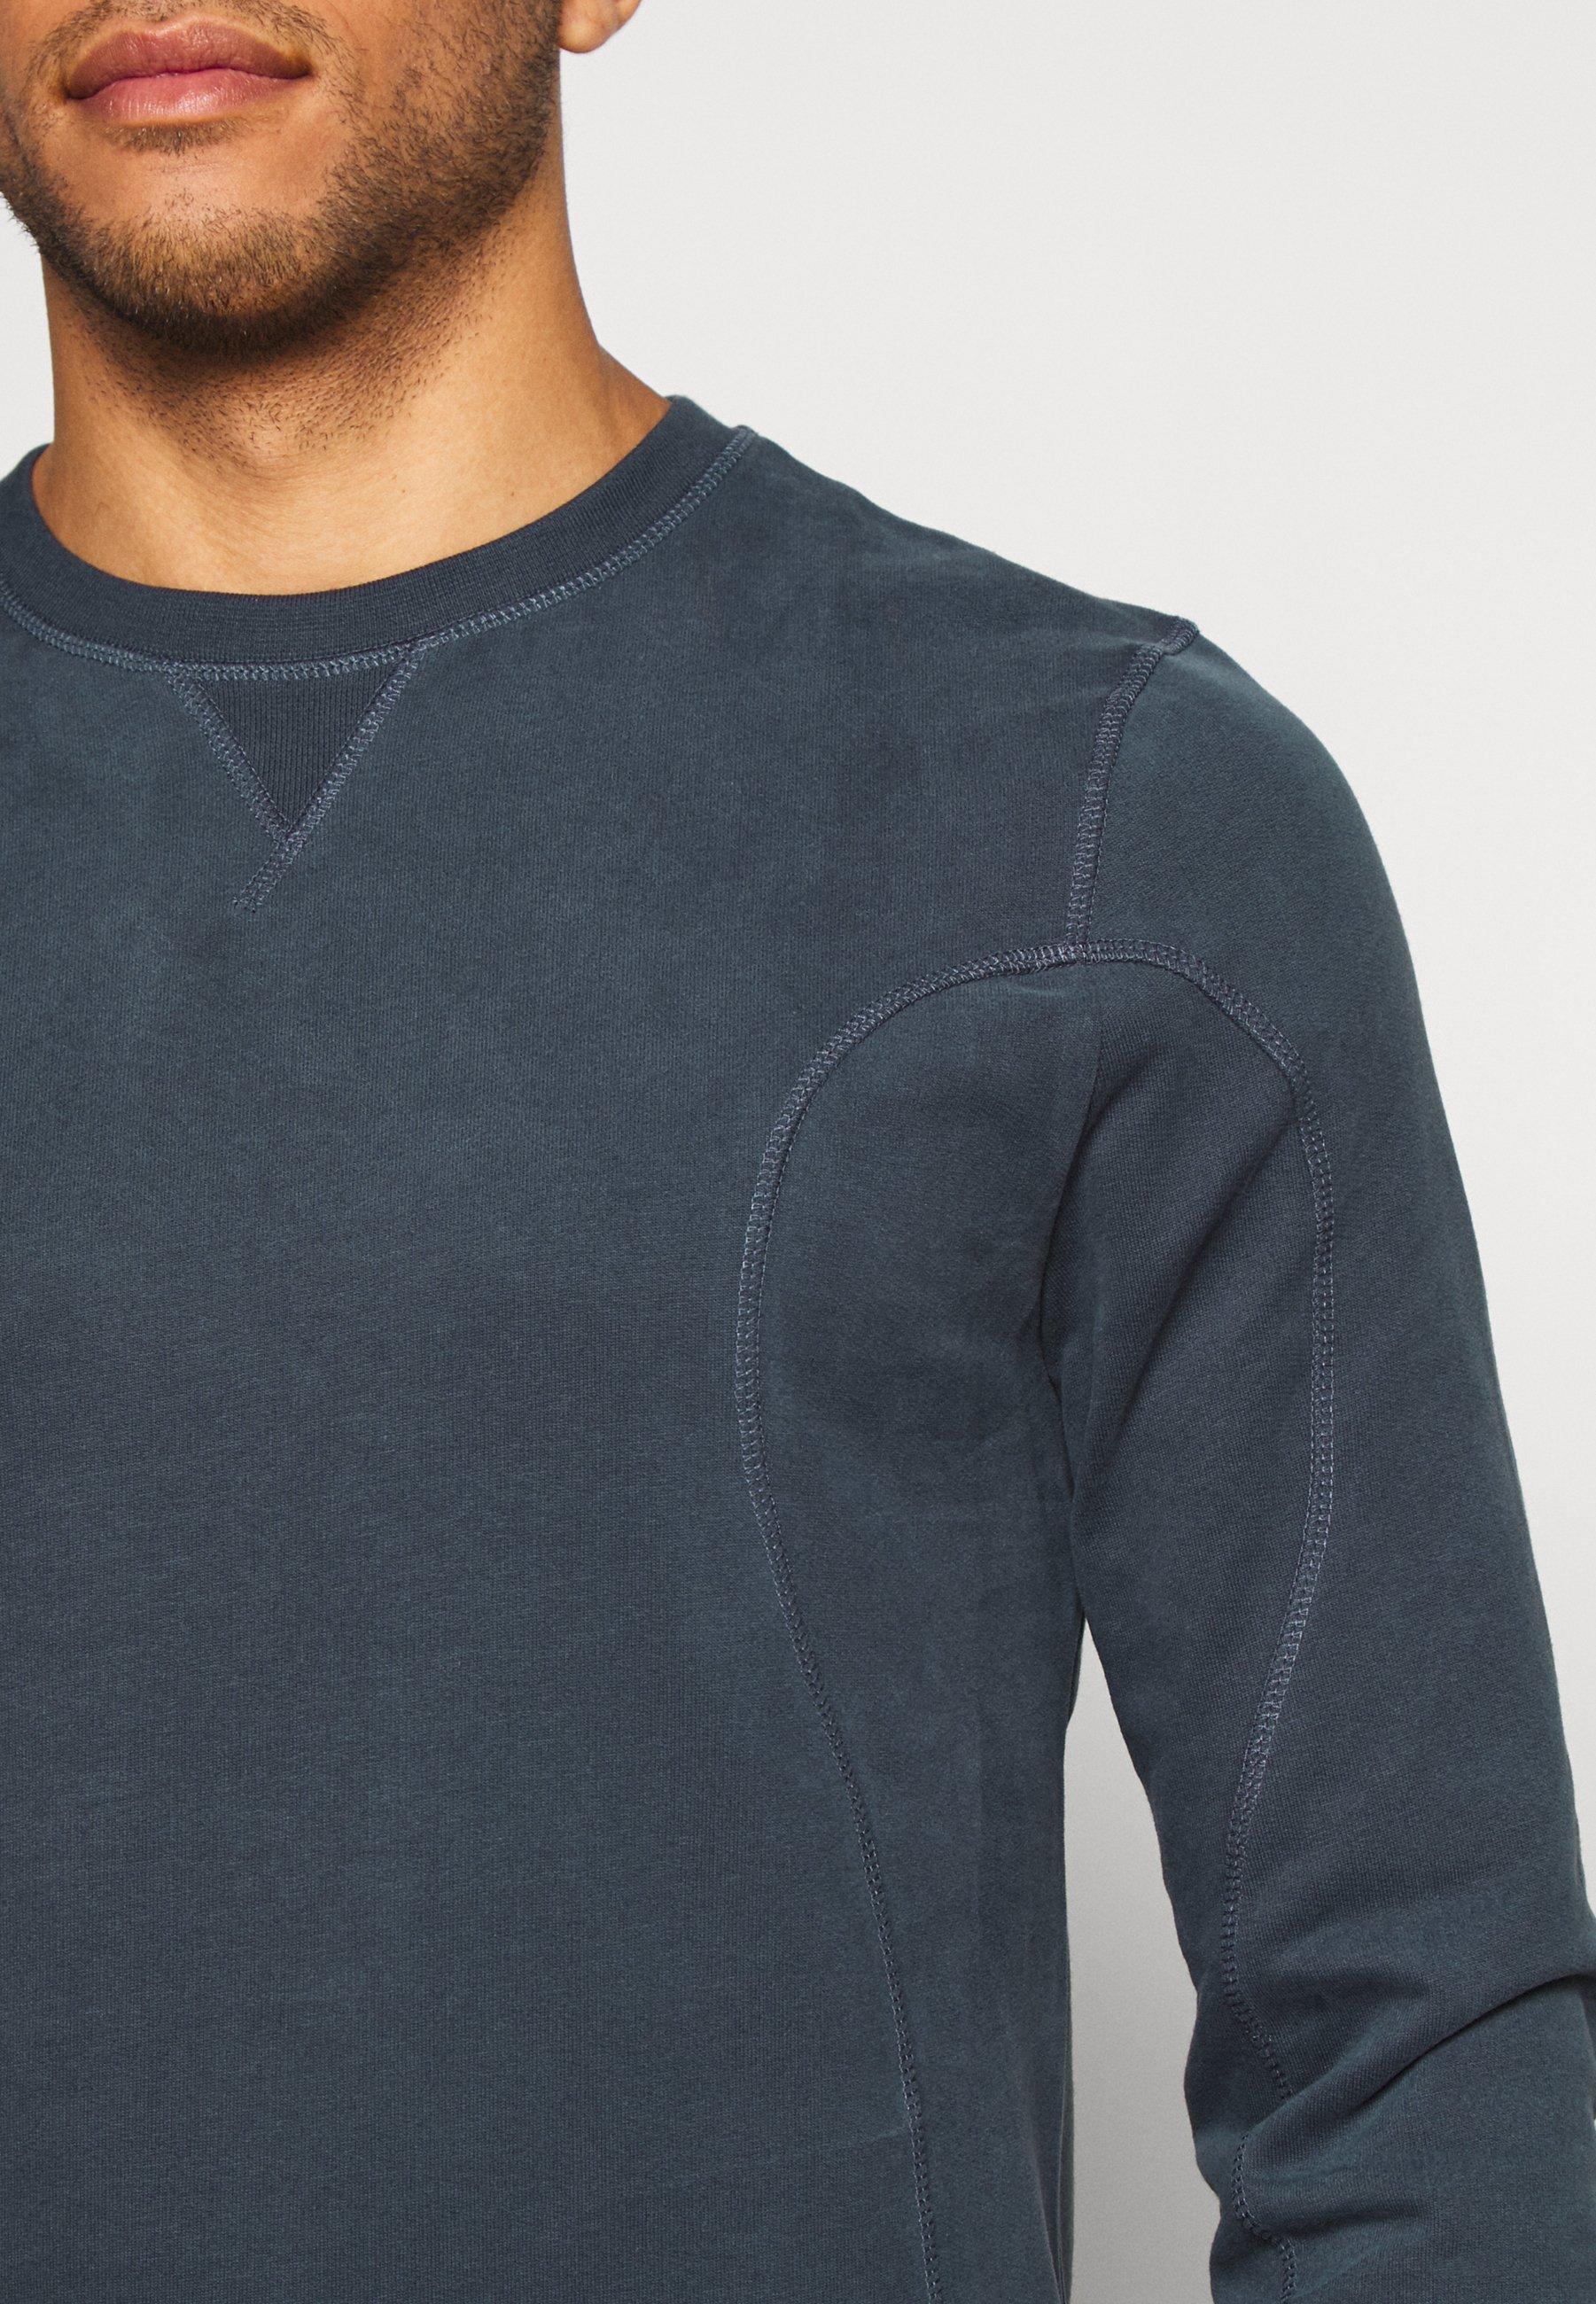 Frescobol Carioca Leblon - Koszulka Do Spania Dark Blue